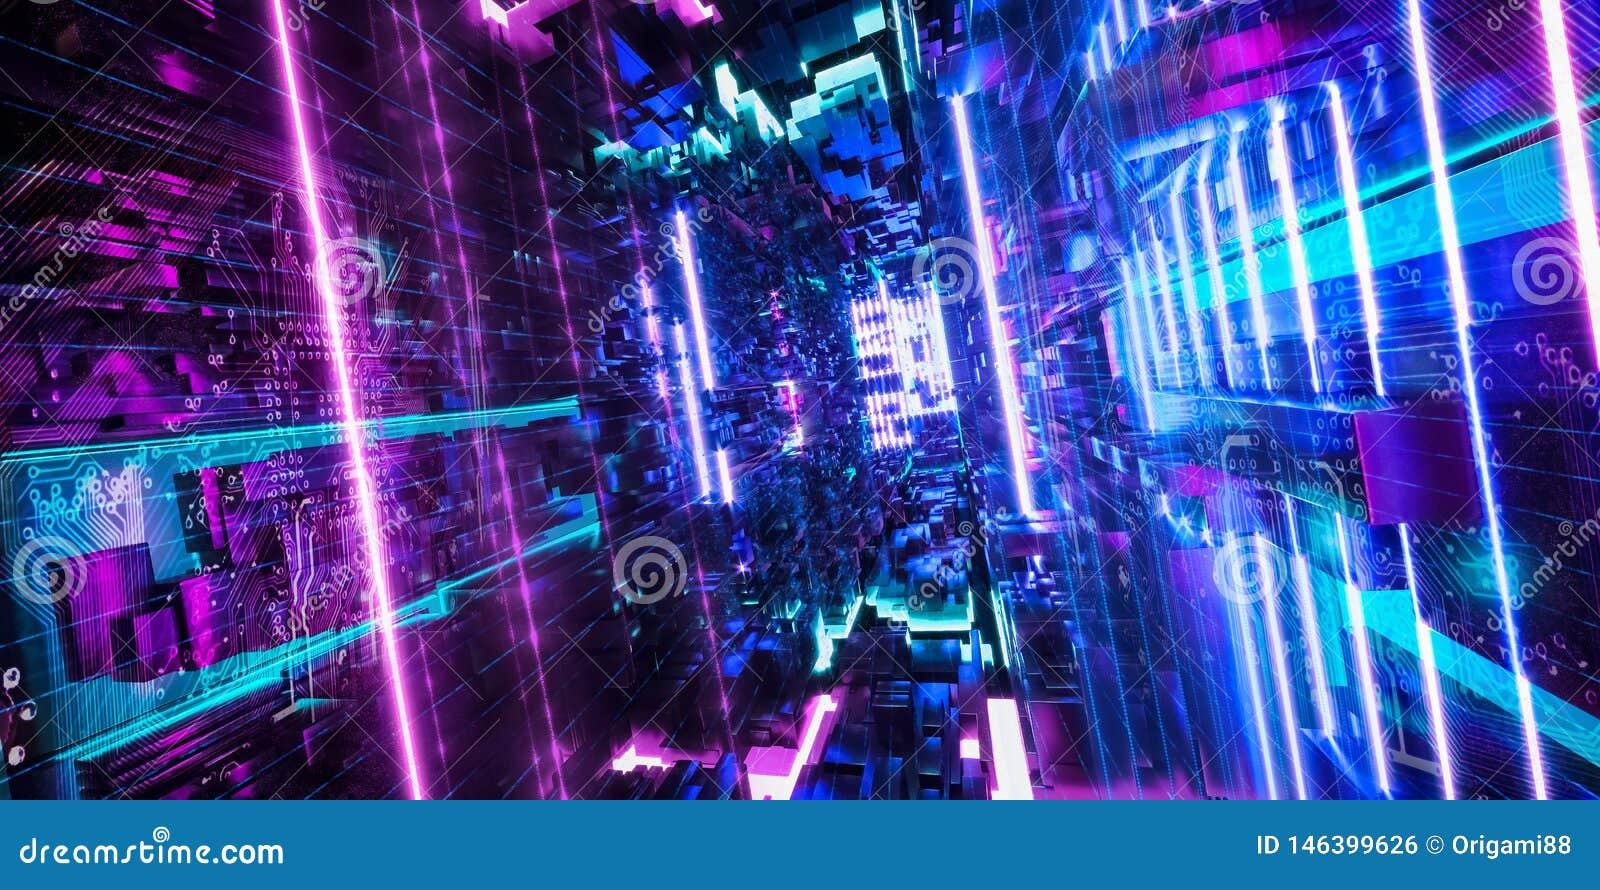 Computador do quantum, armazenamento, realidade virtual, luz de néon azul do rosa futurista rendi??o 3d